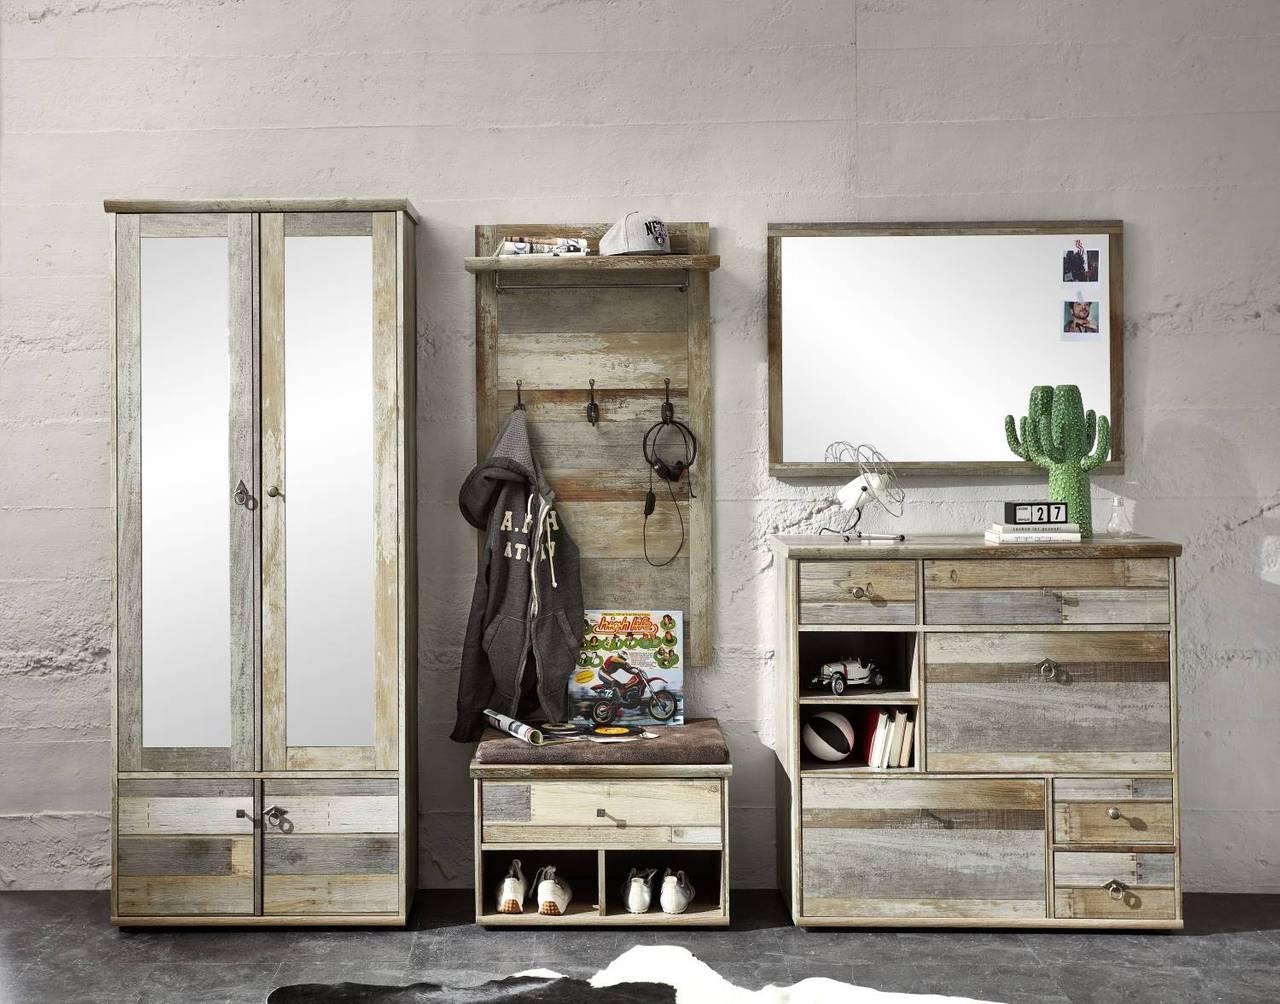 garderobenset bonanza dd80 driftwood nachbildung 5 teilig. Black Bedroom Furniture Sets. Home Design Ideas